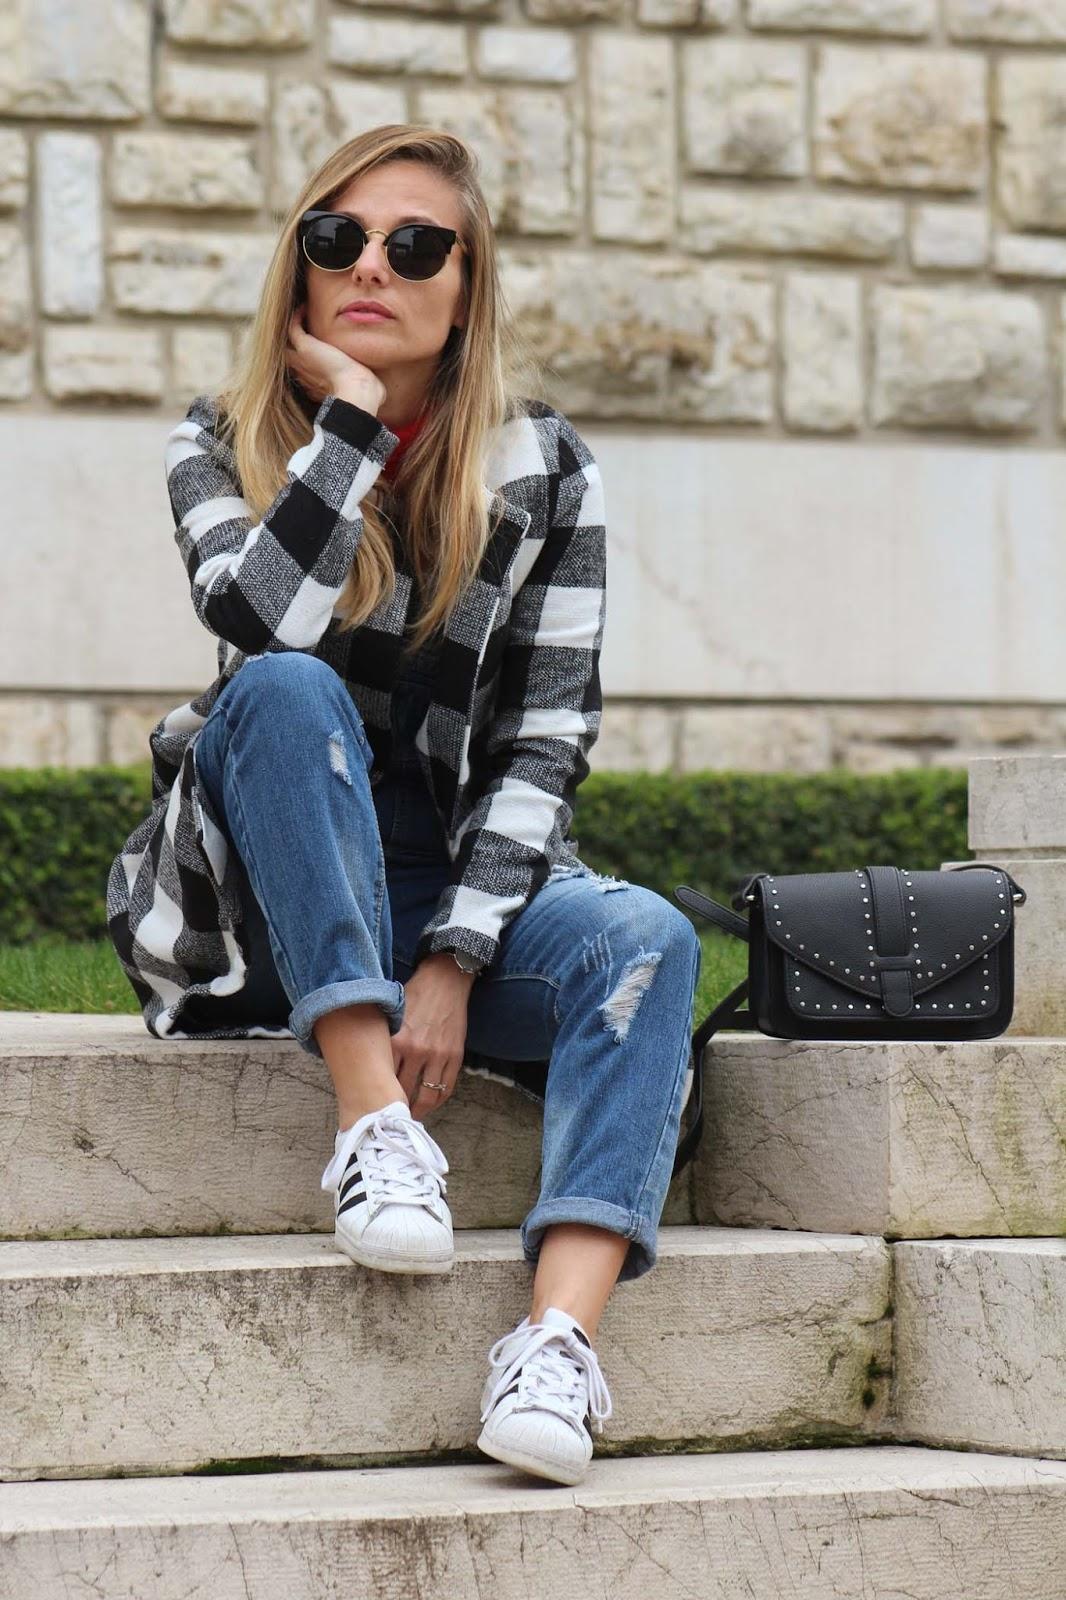 Eniwhere Fashion - Checked Coat Shein